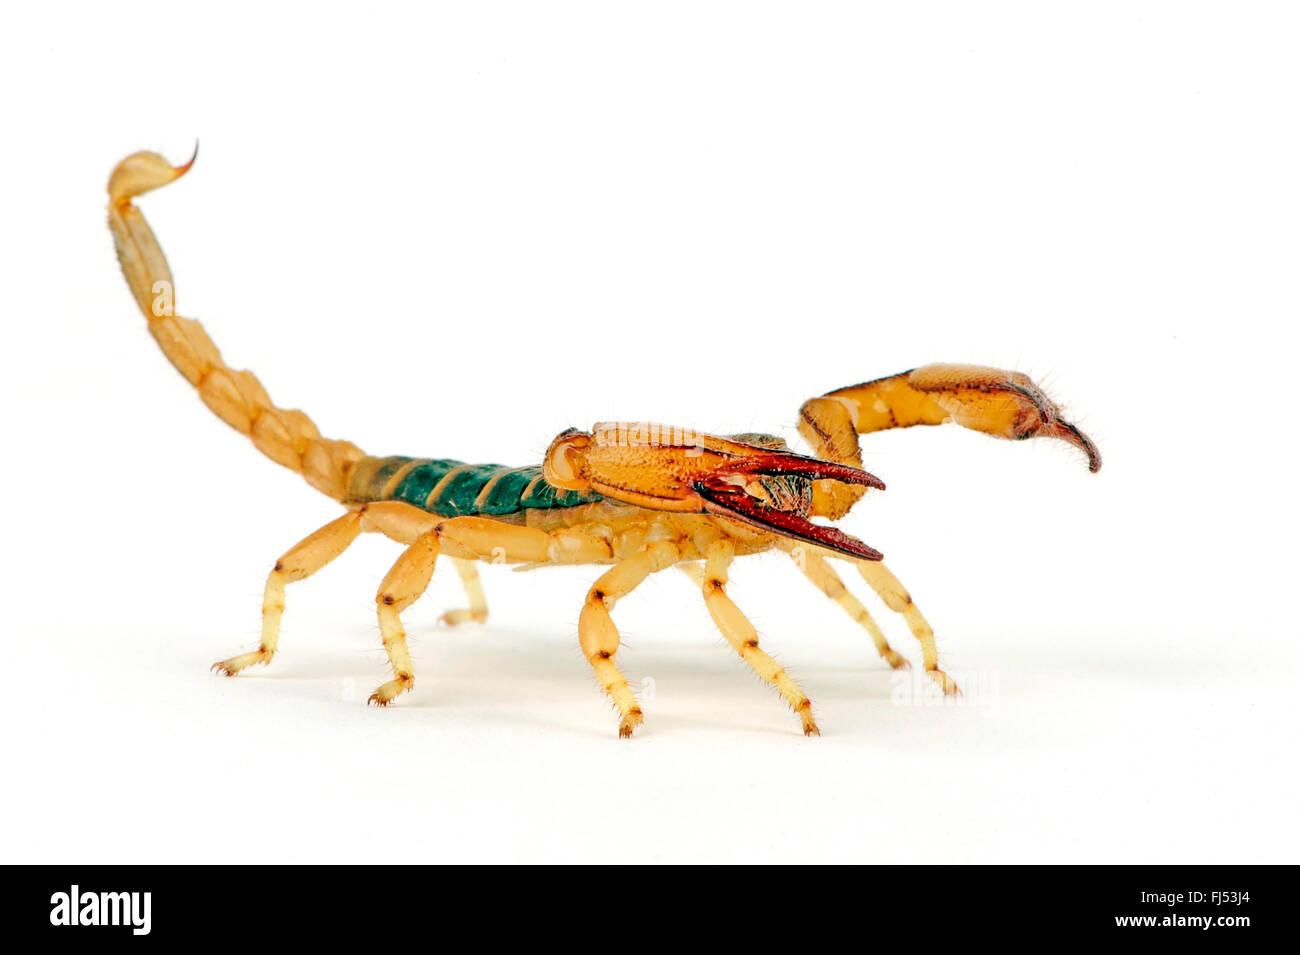 Scorpion fouisseur robuste, Carinated scorpion, écorce jaune africains-jambe (scorpion Opistophthalmus carinatus), Photo Stock